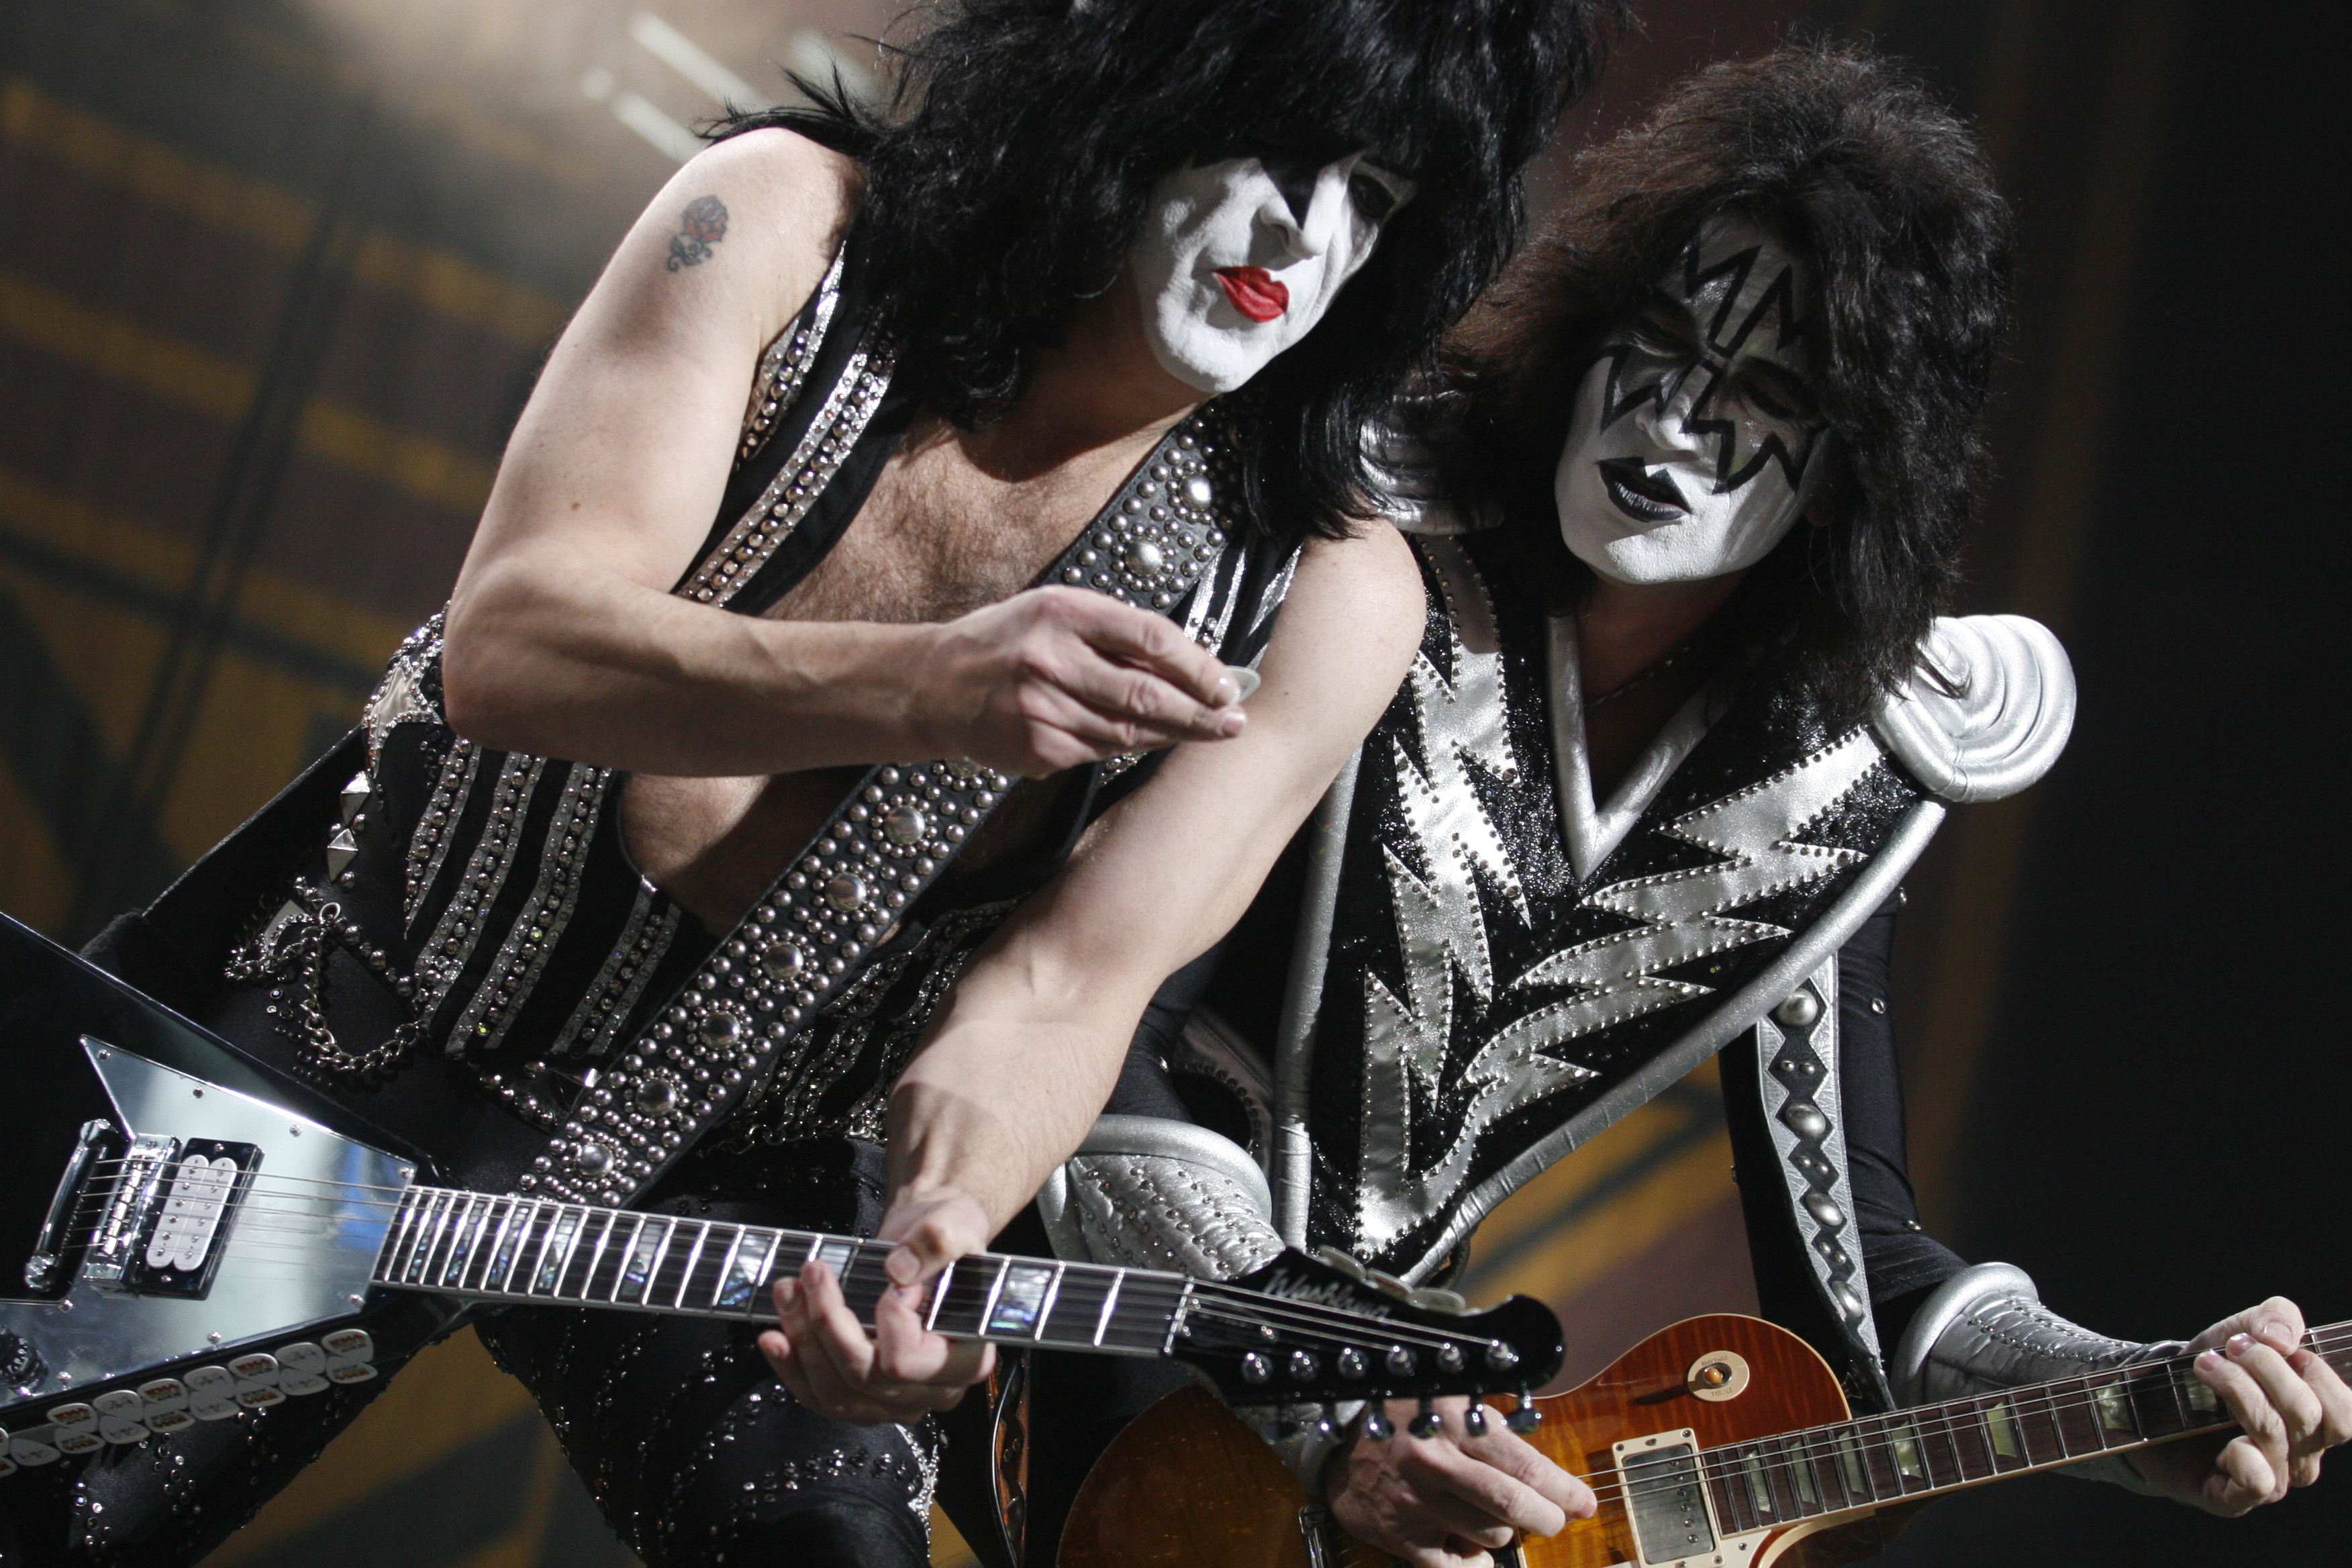 Kiss heavy metal rock bands concert guitar p wallpaper background 3504x2336